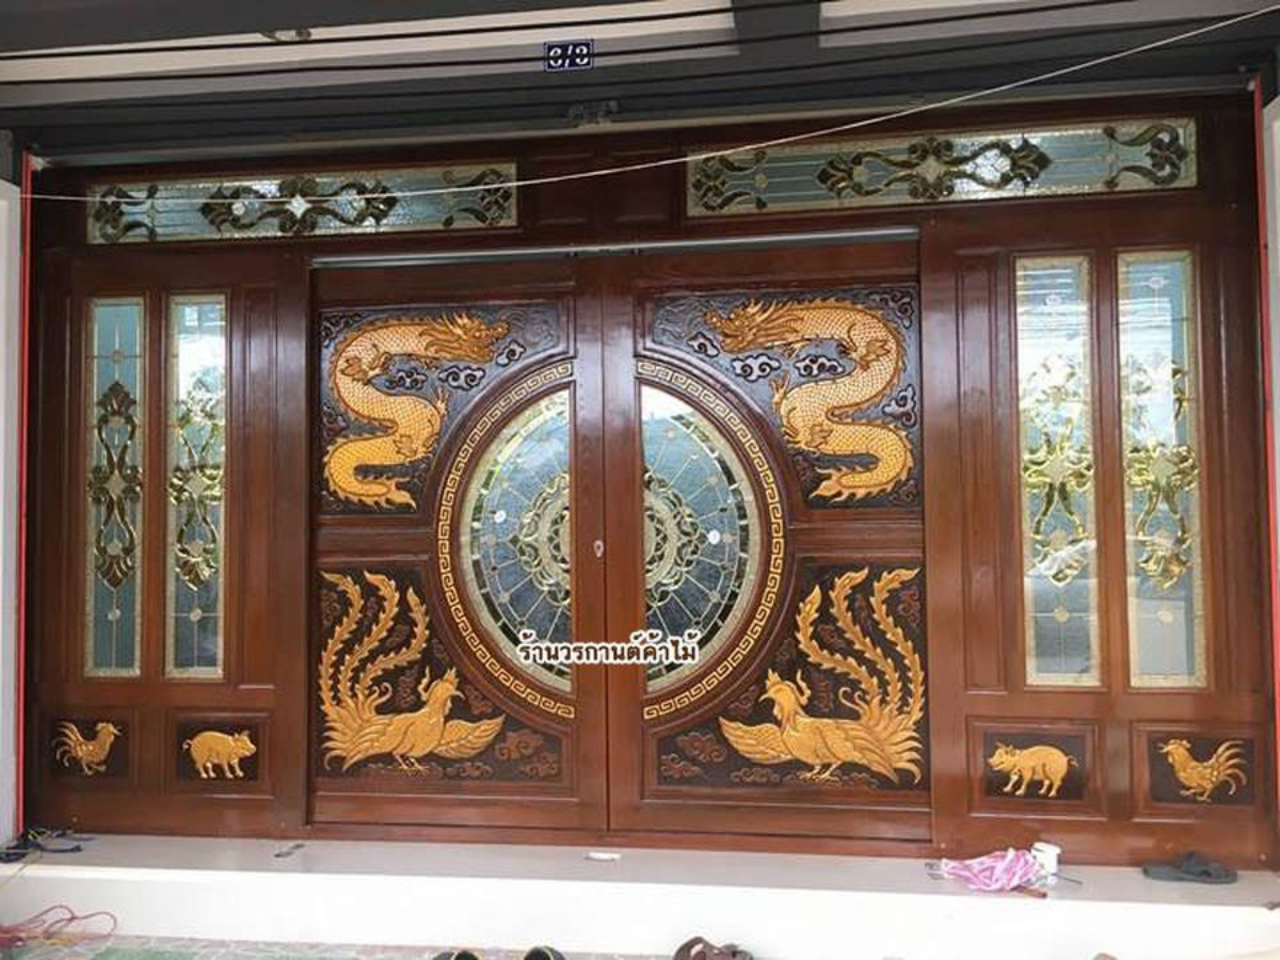 door-woodhome จำหน่ายประตูไม้สัก,ประตูไม้สักกระจกนิรภัย,ประตูไม้สักบานคู่ รูปที่ 2